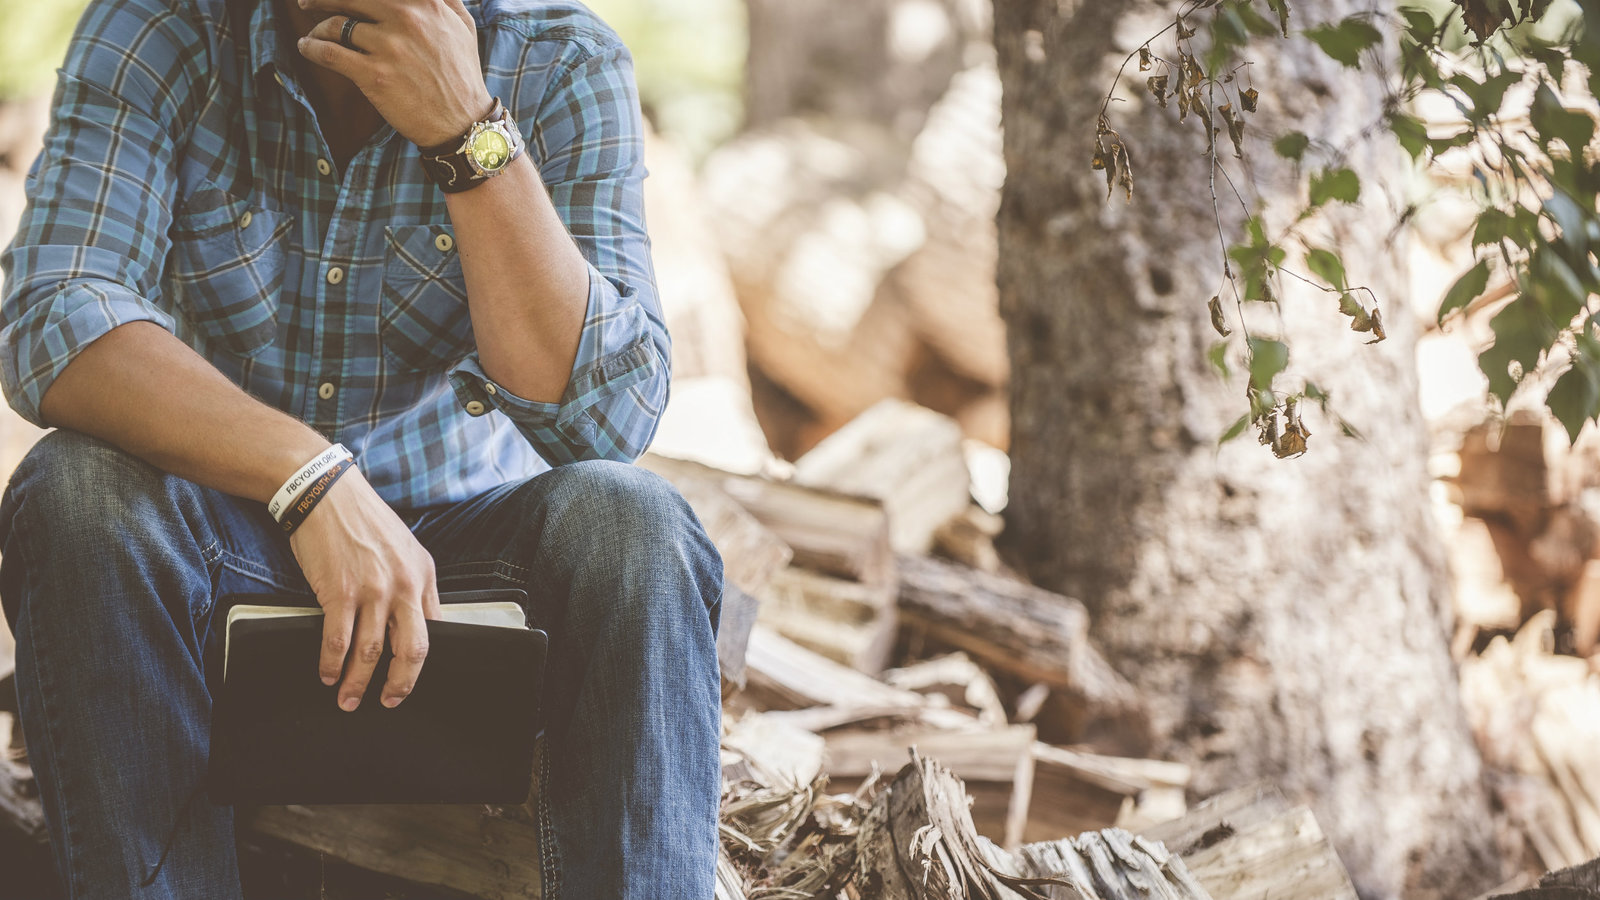 Calvinists Should Be Calmest and Kindest zjwozdbz